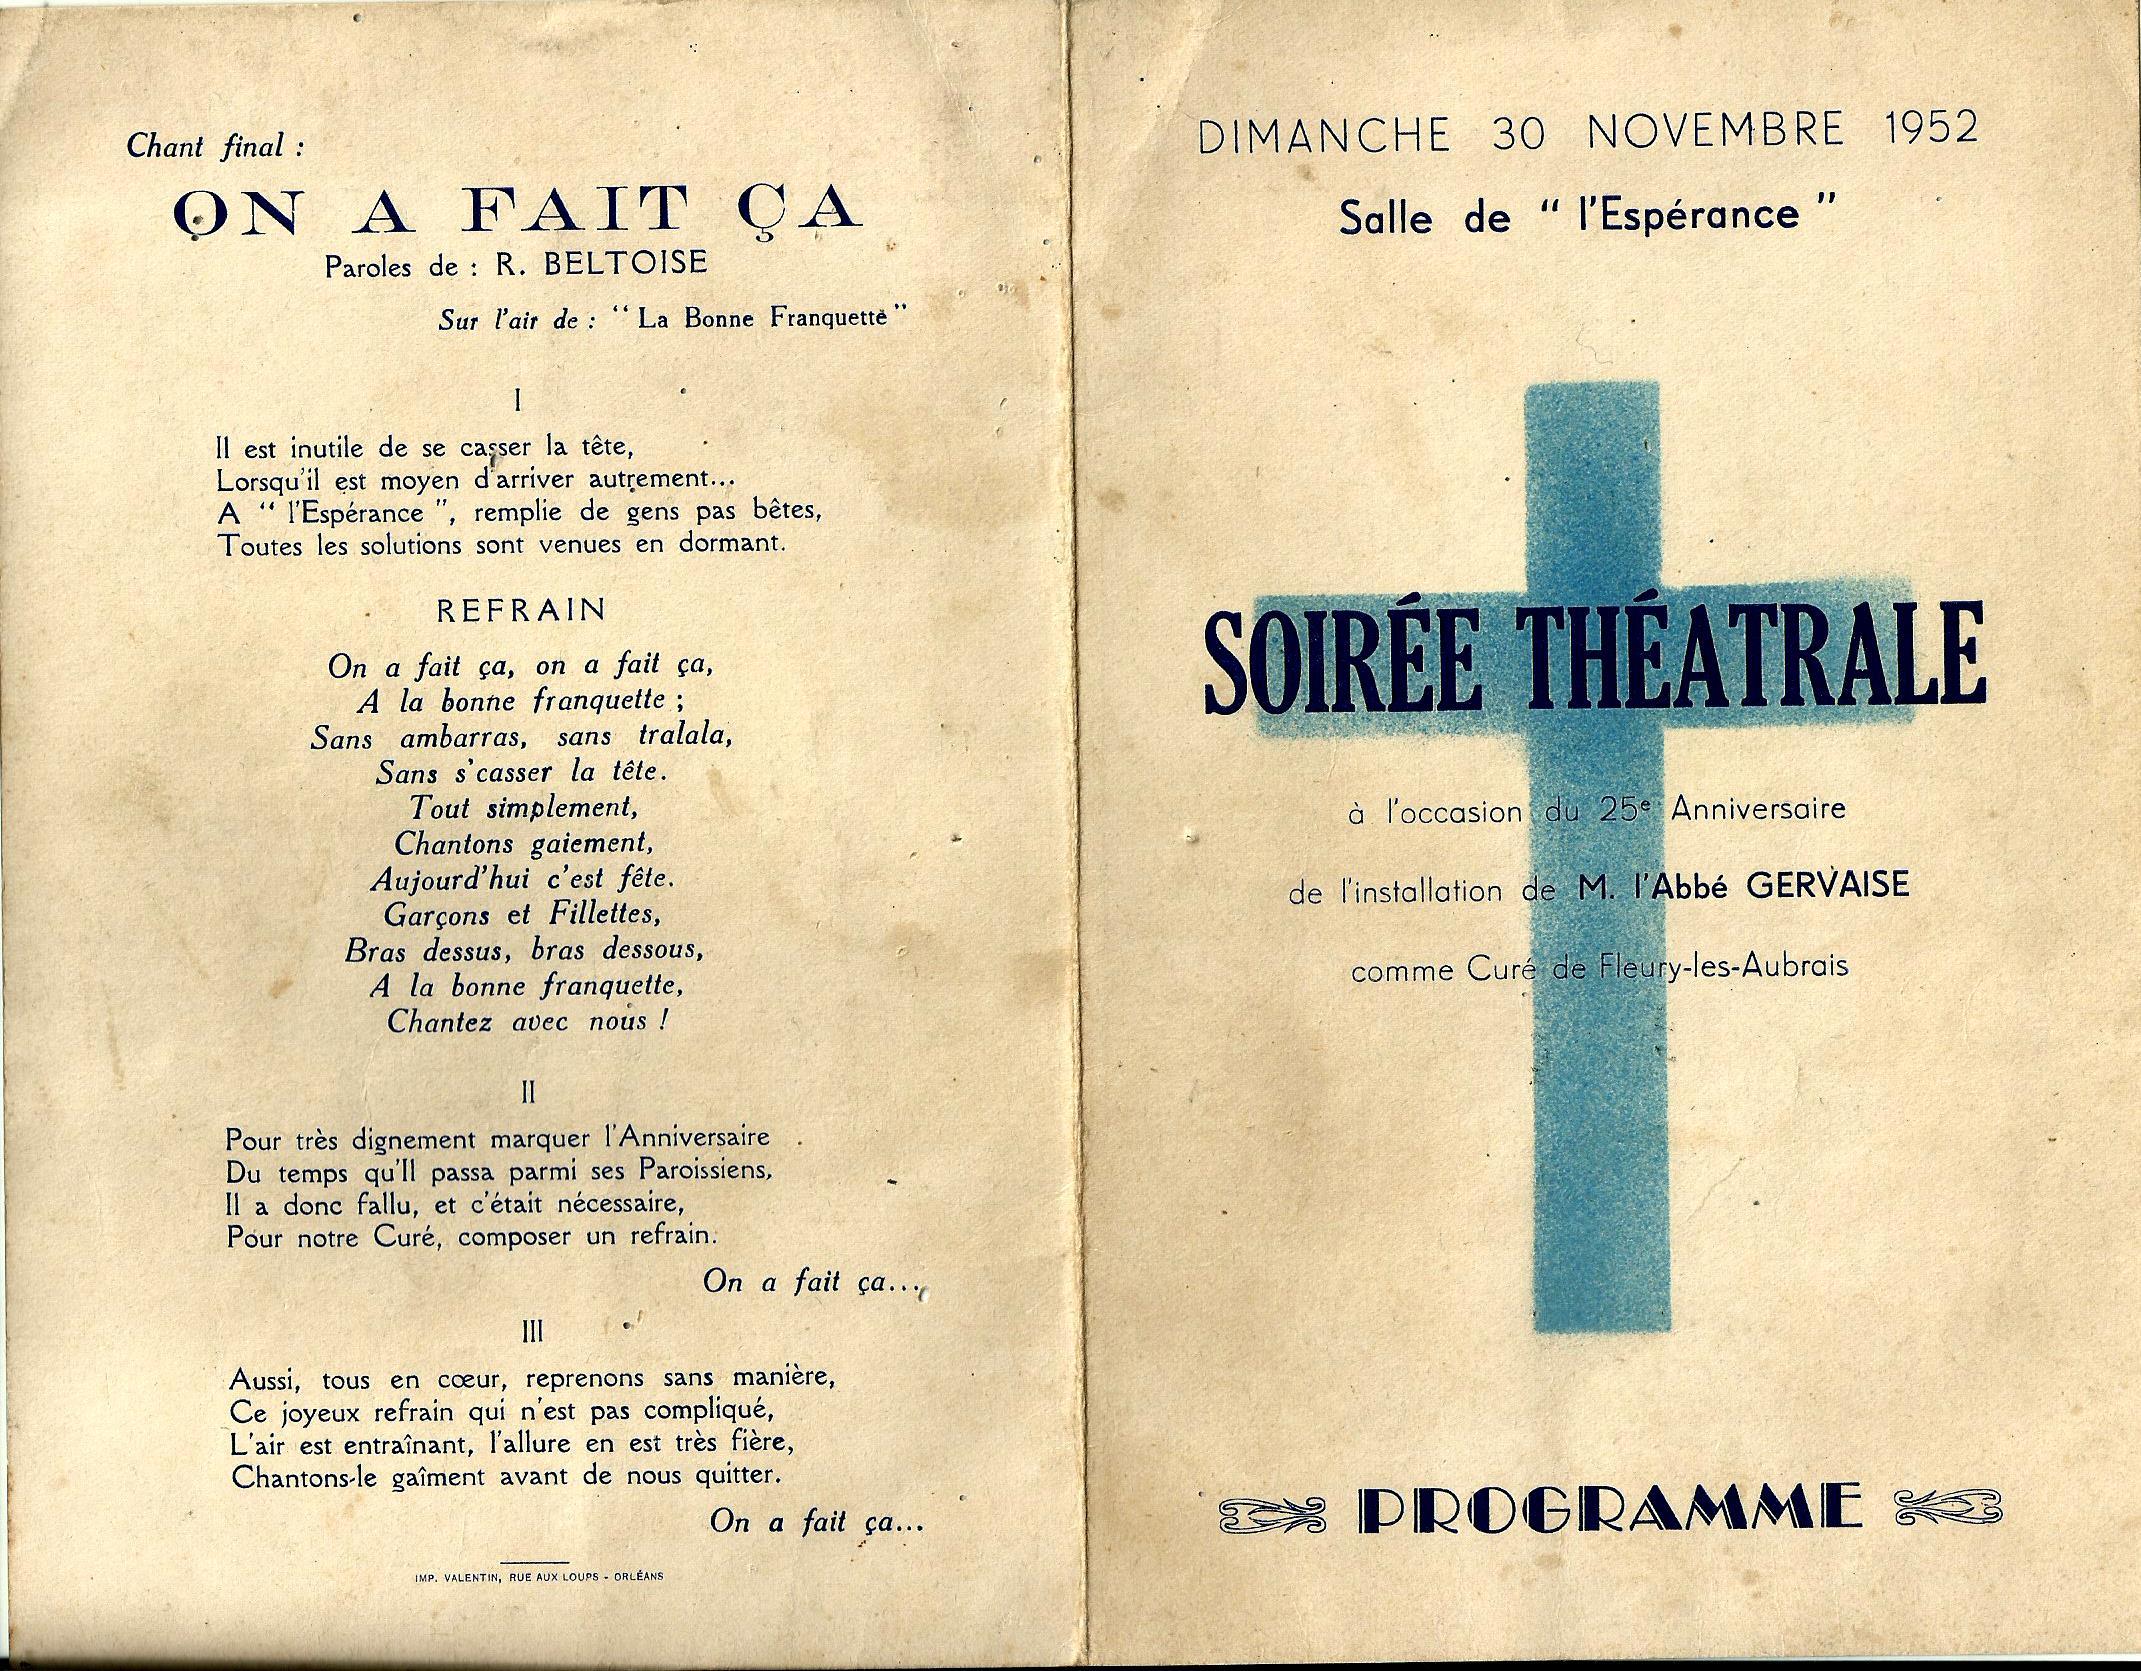 Scan Soirée théatrale salle de l'espérance 1952 (30.11.1952).jpg